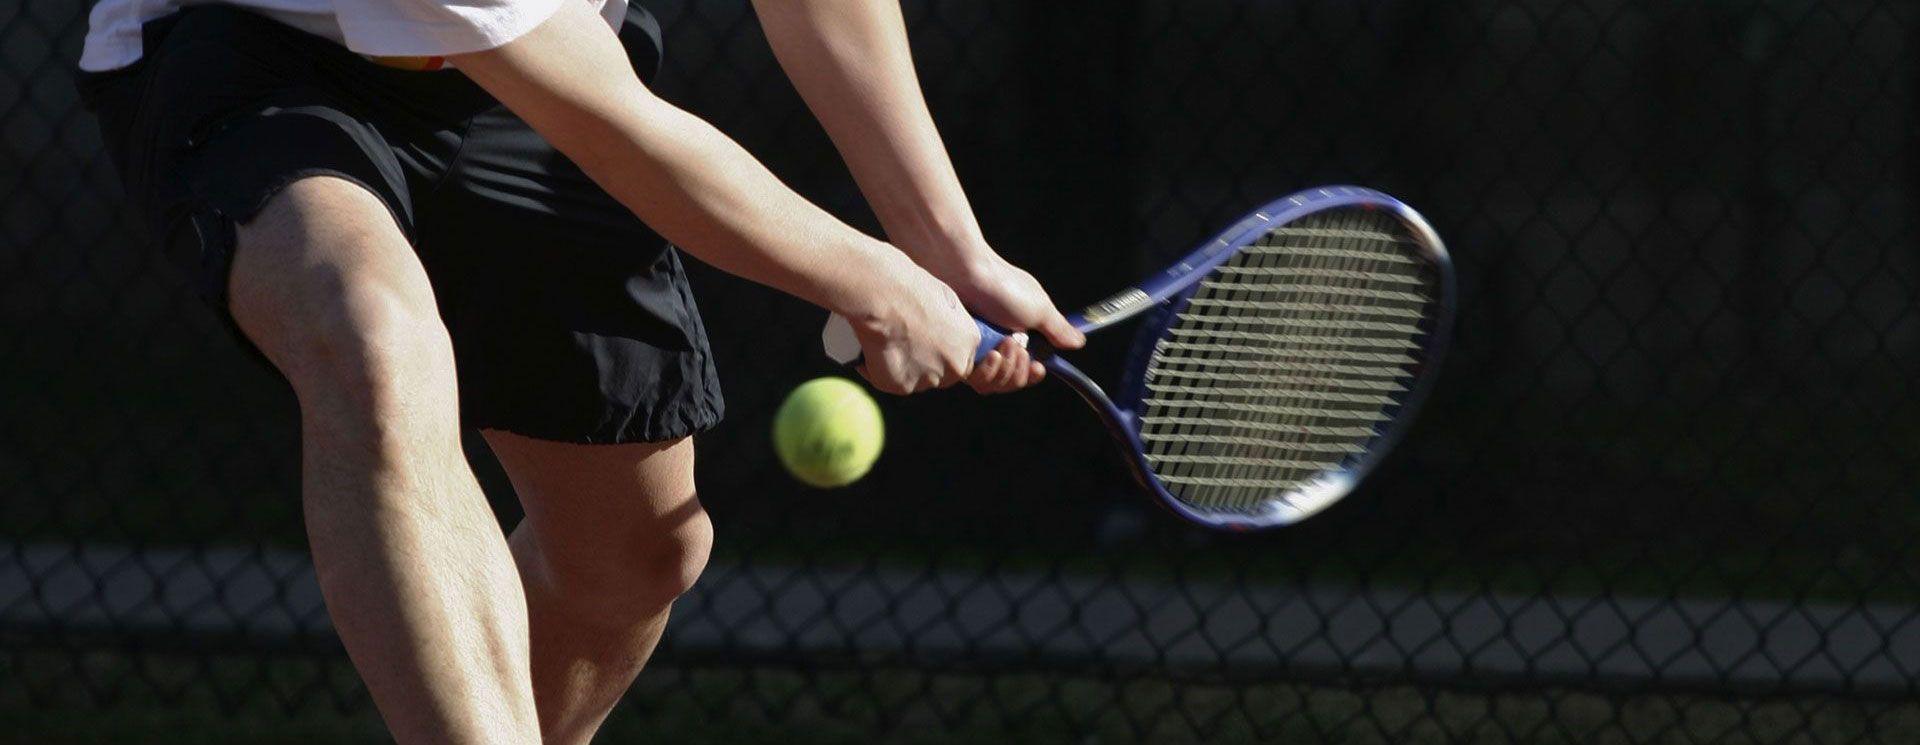 hero-tennis1